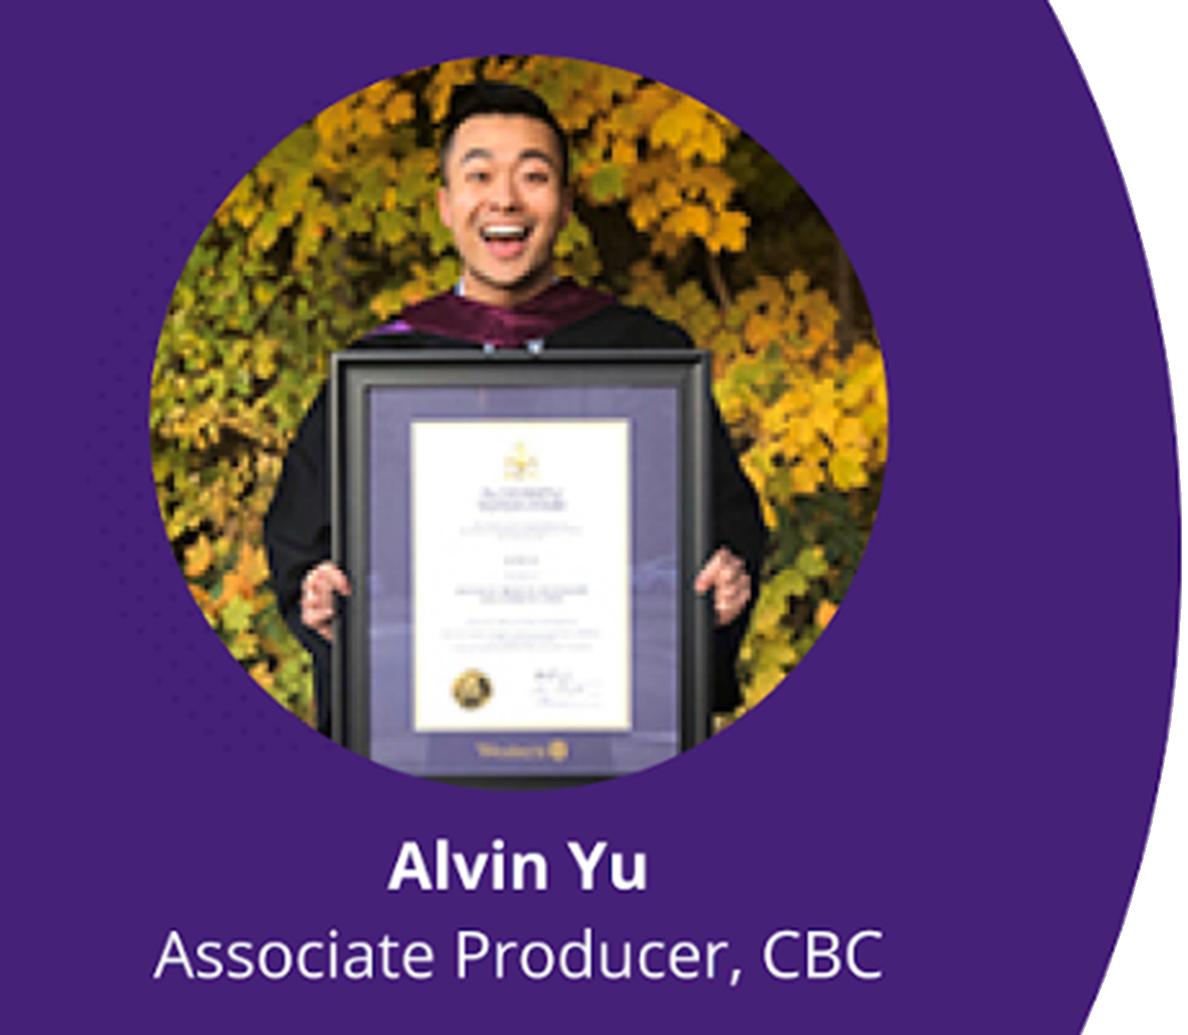 Alvin Yu, Associate Producer, CBC